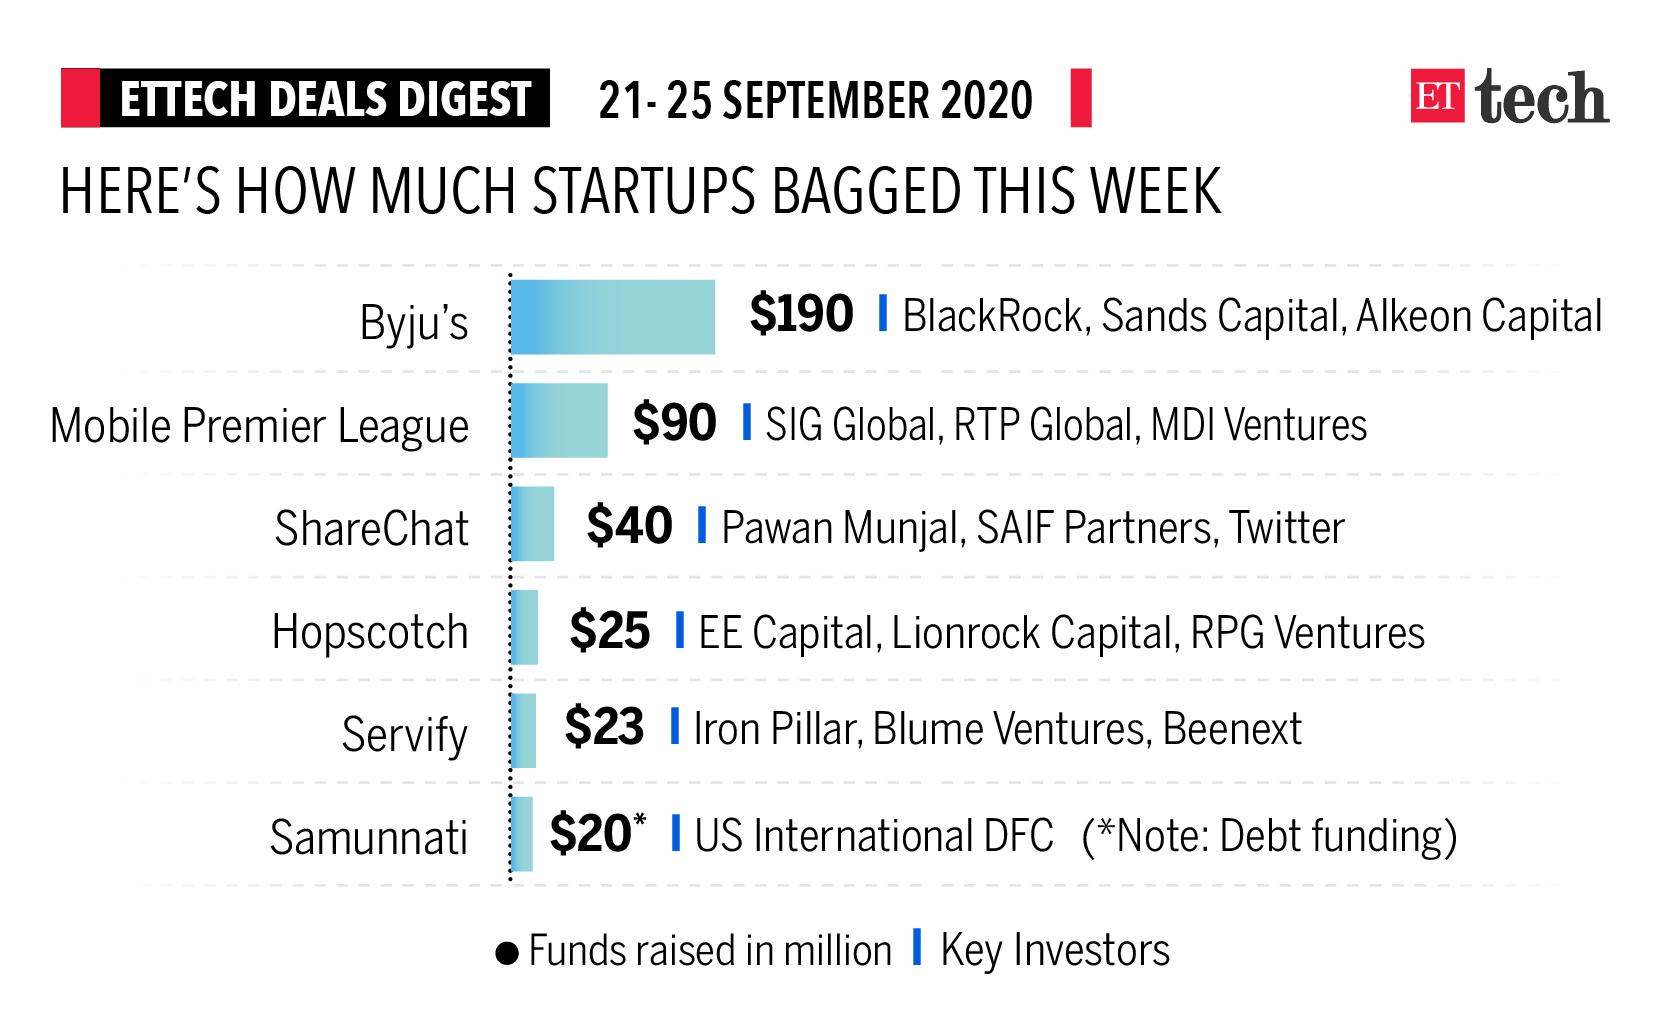 ETtech Deals Digest: Byju's, Mobile Premier League, ShareChat bag funds this week